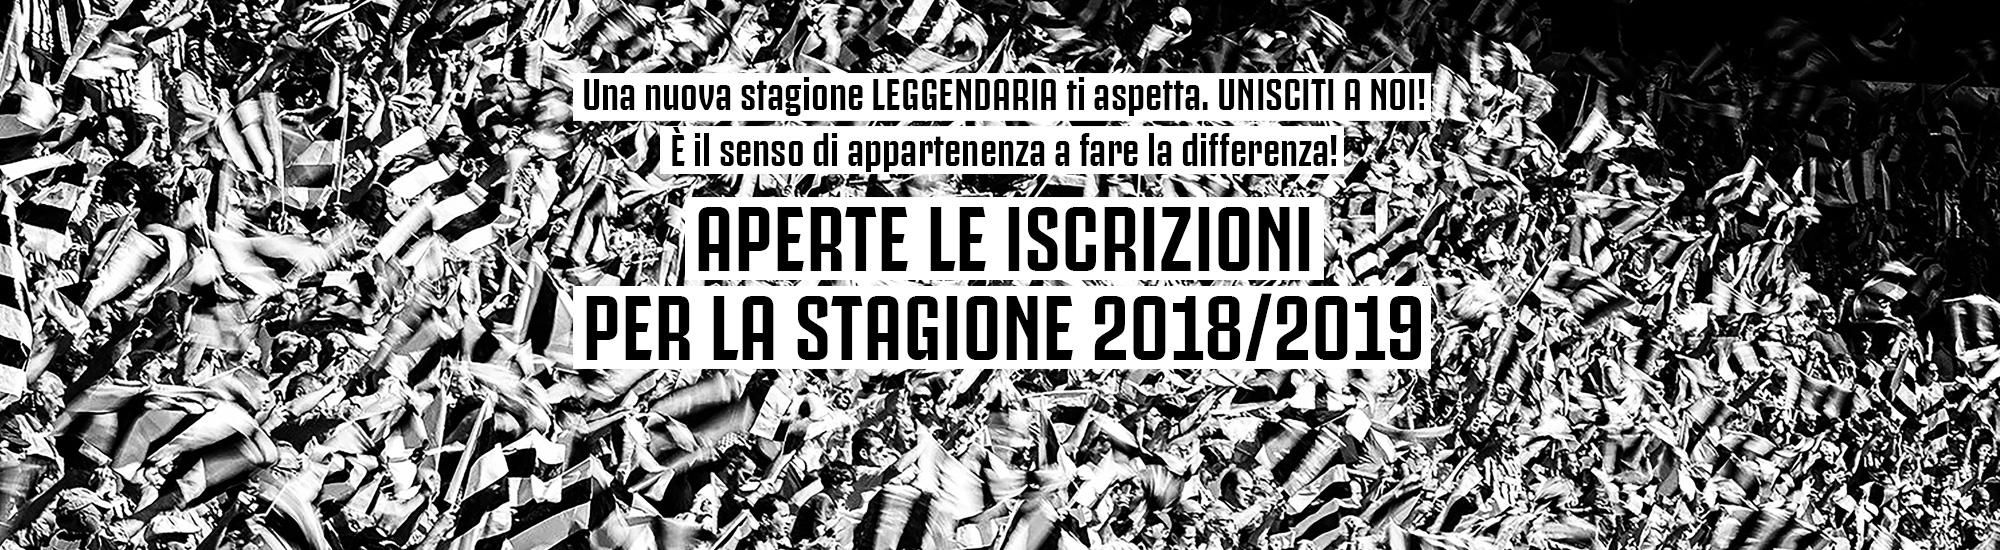 JOFC Leggenda Bianconera tesseramento stagione 18/19